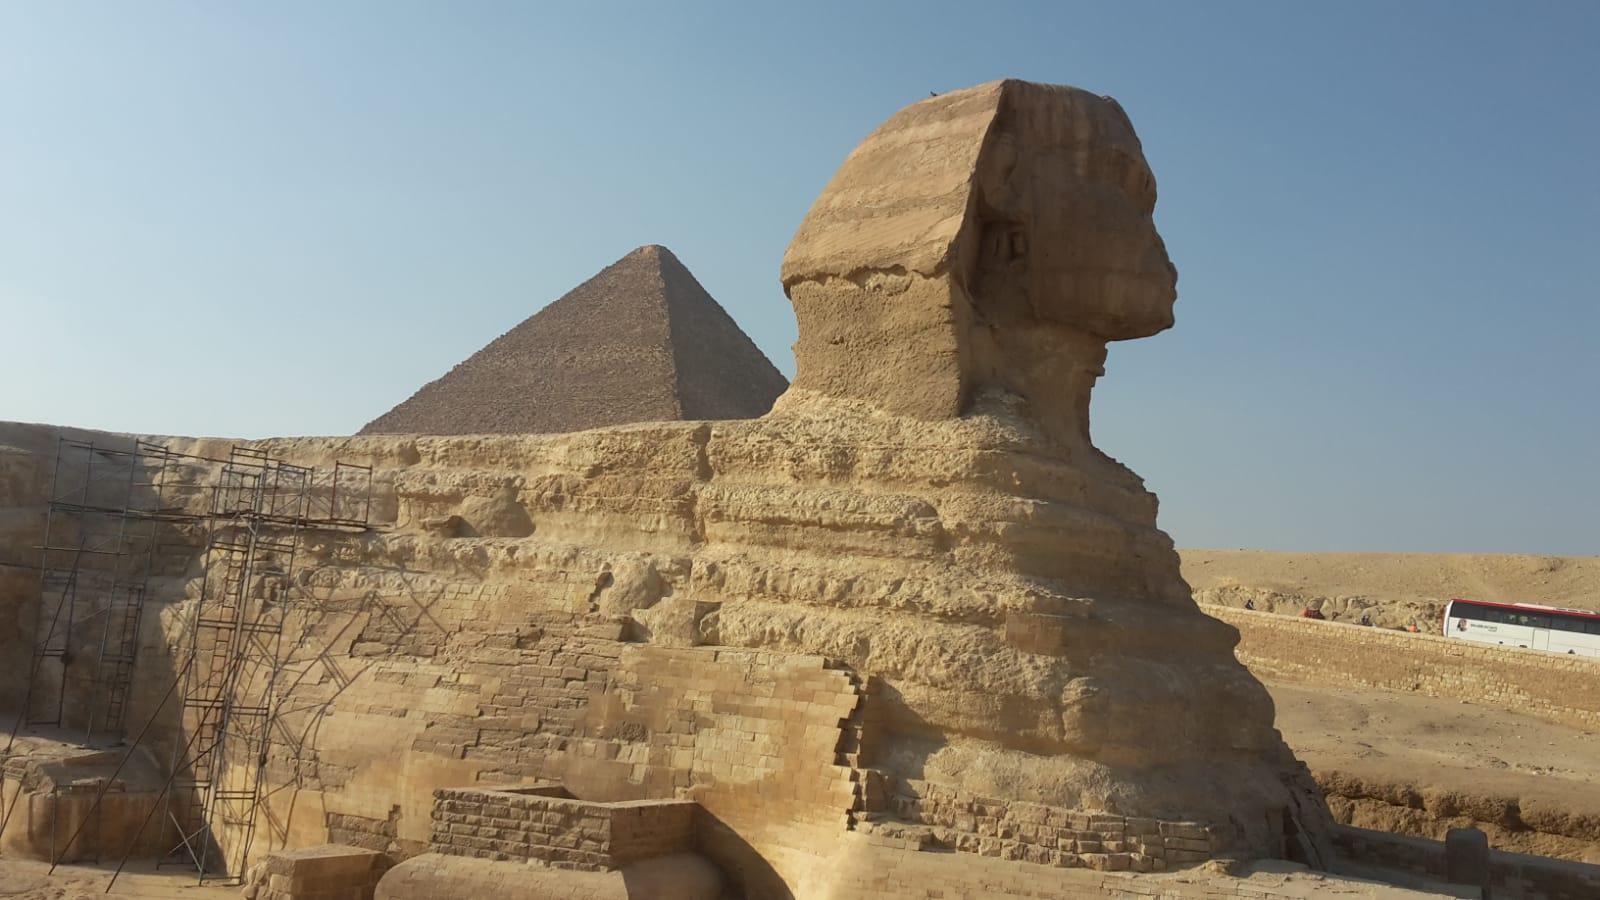 Ab El Quseir nach Kairo mit dem Flugzeug 2 tägiger Ausflug